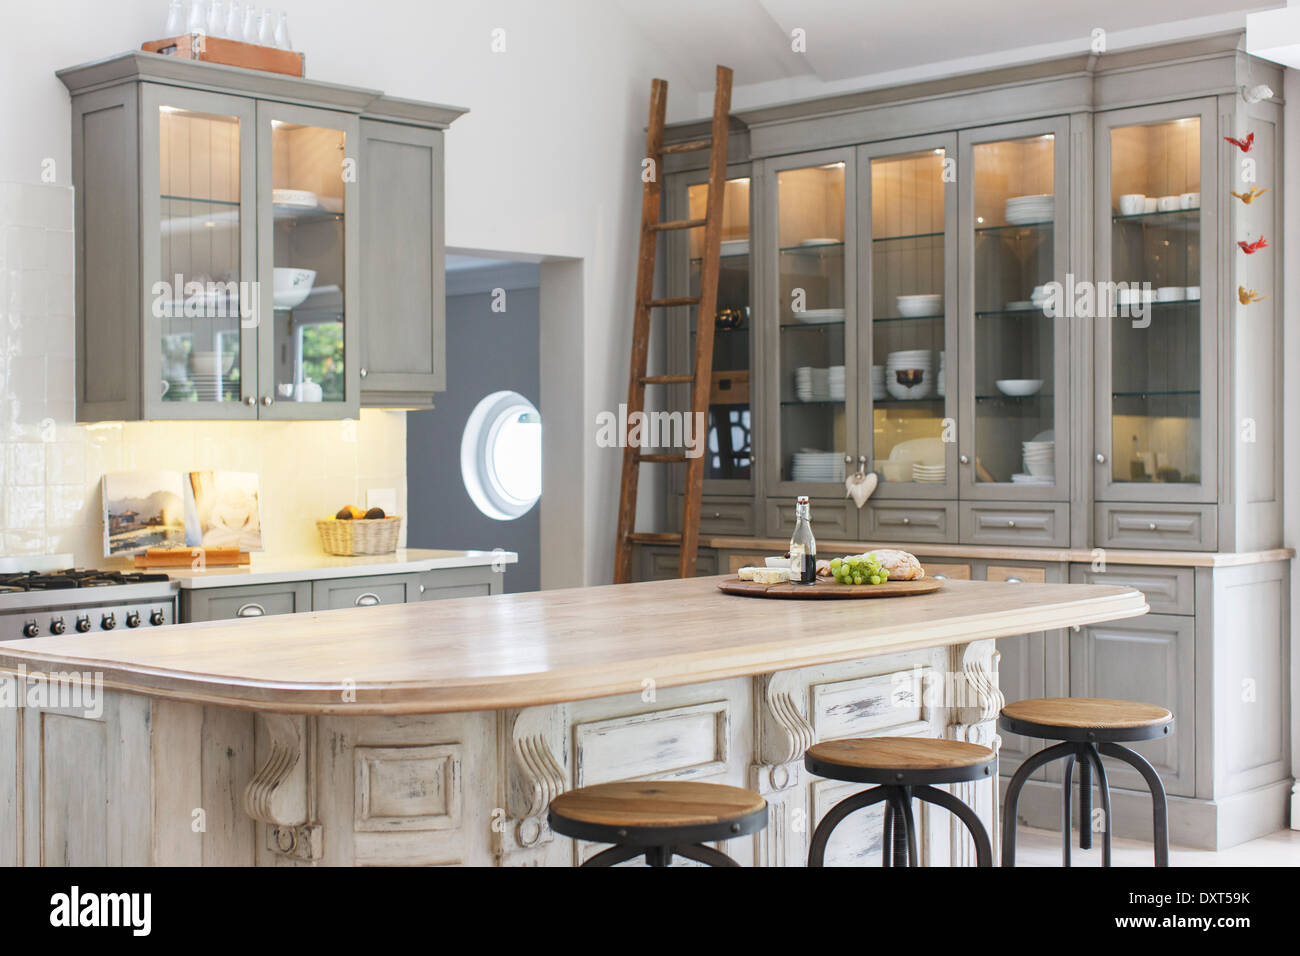 Luxury kitchen - Stock Image